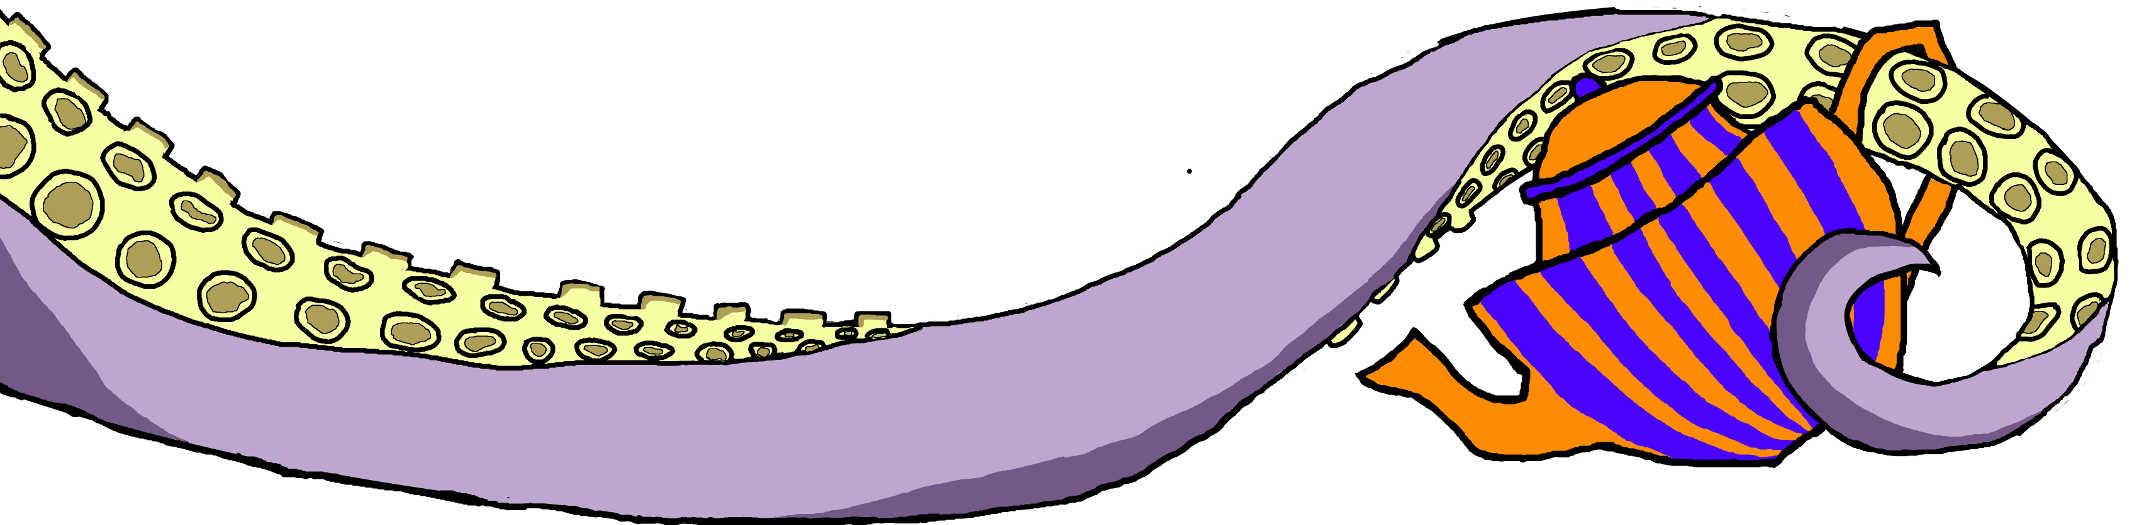 Tetra's tentacle holding a teapot.